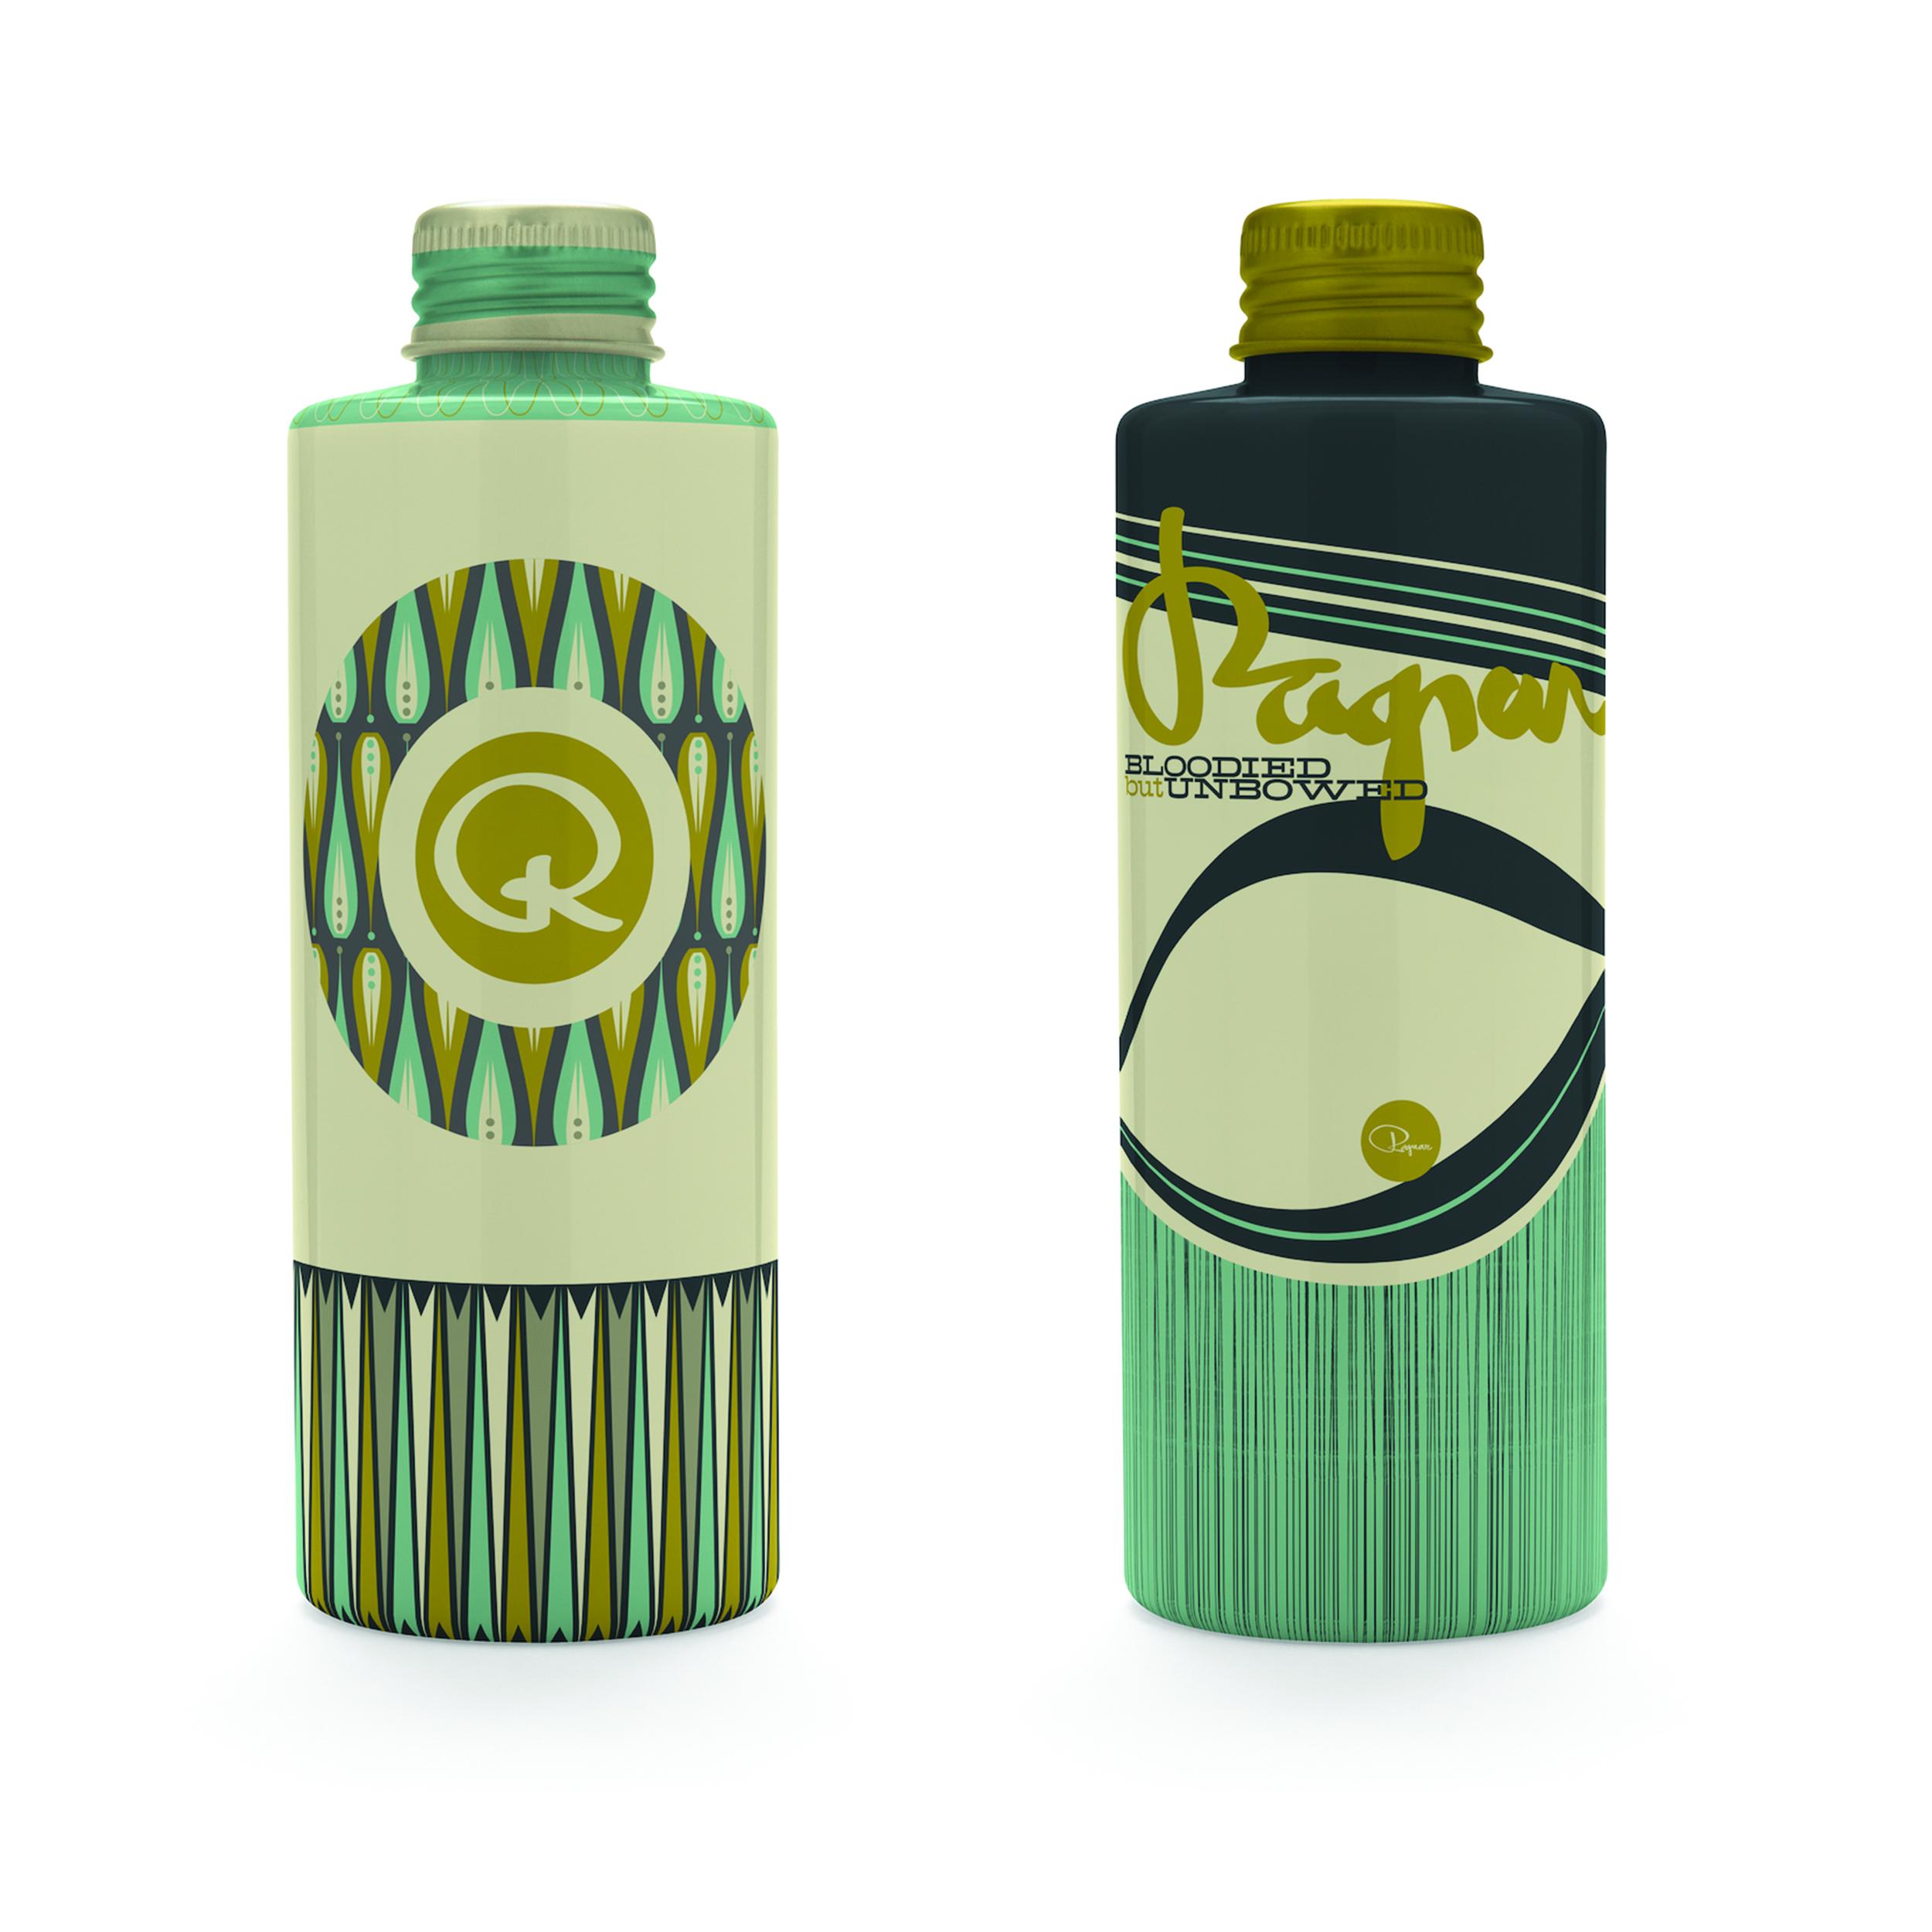 Ragnarama Product Sample